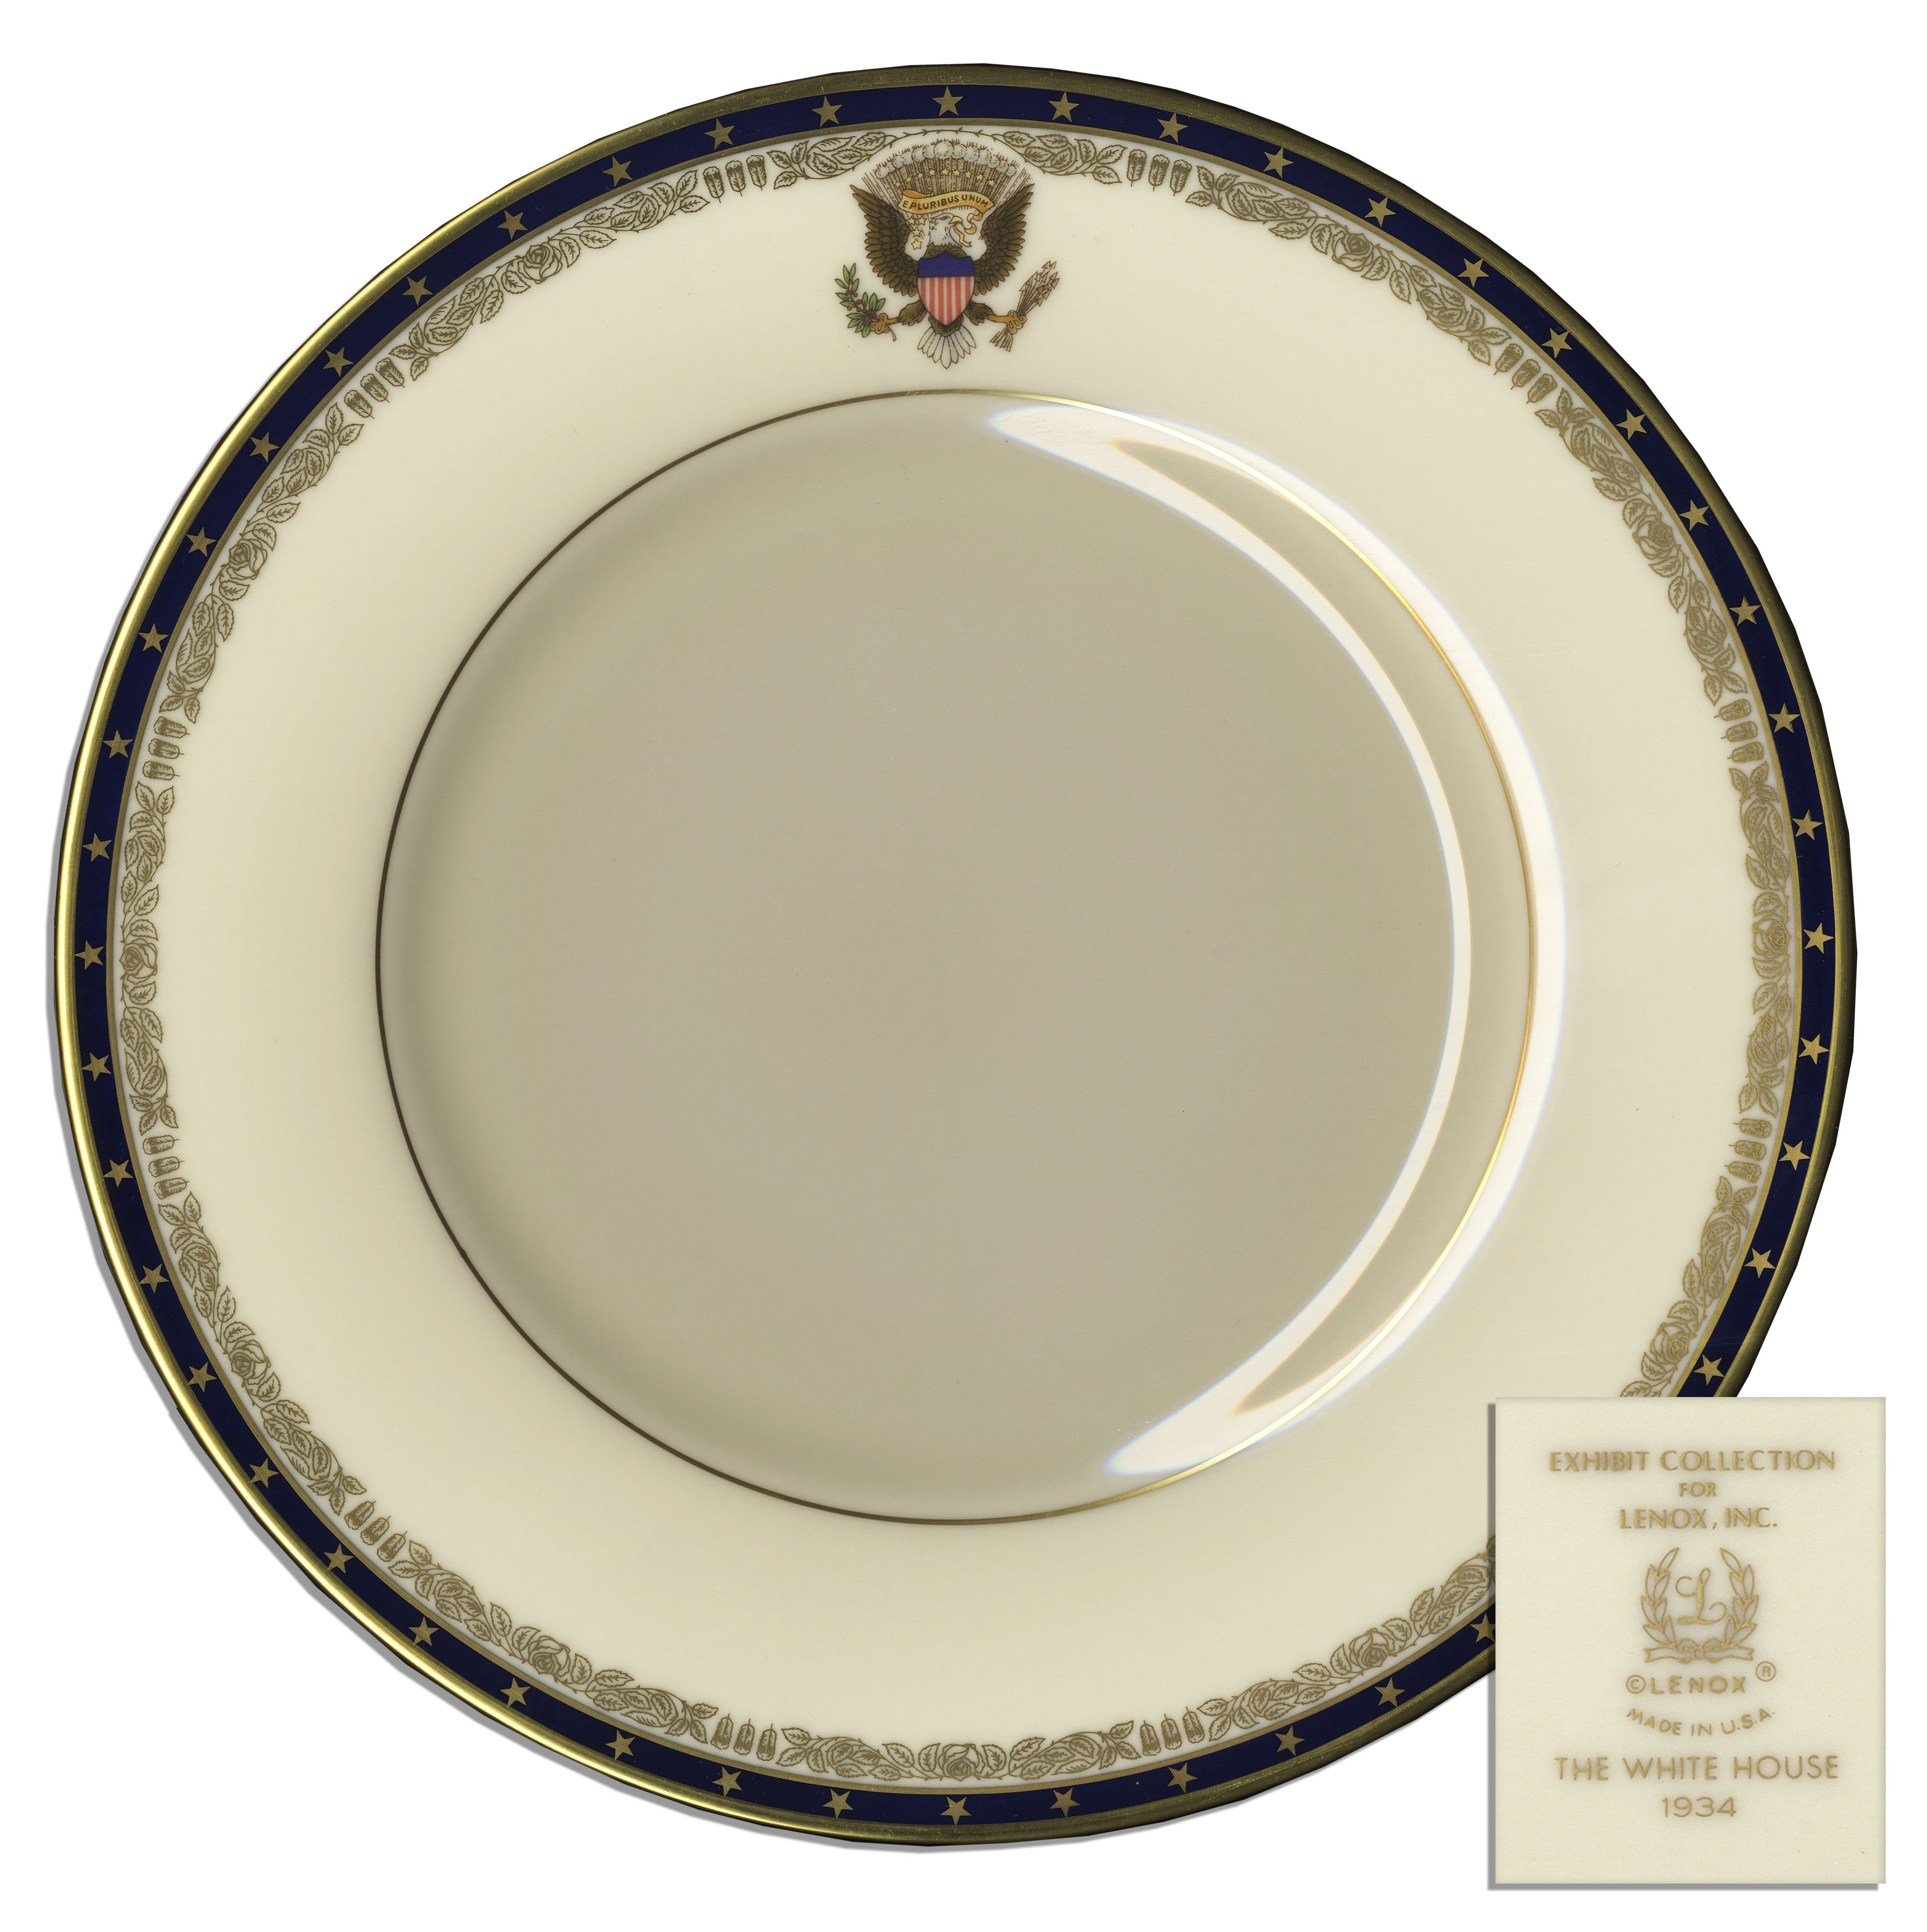 Franklin D. Roosevelt Memorabilia President Franklin D. Roosevelt Official White House China Dinner Plate -- Fine